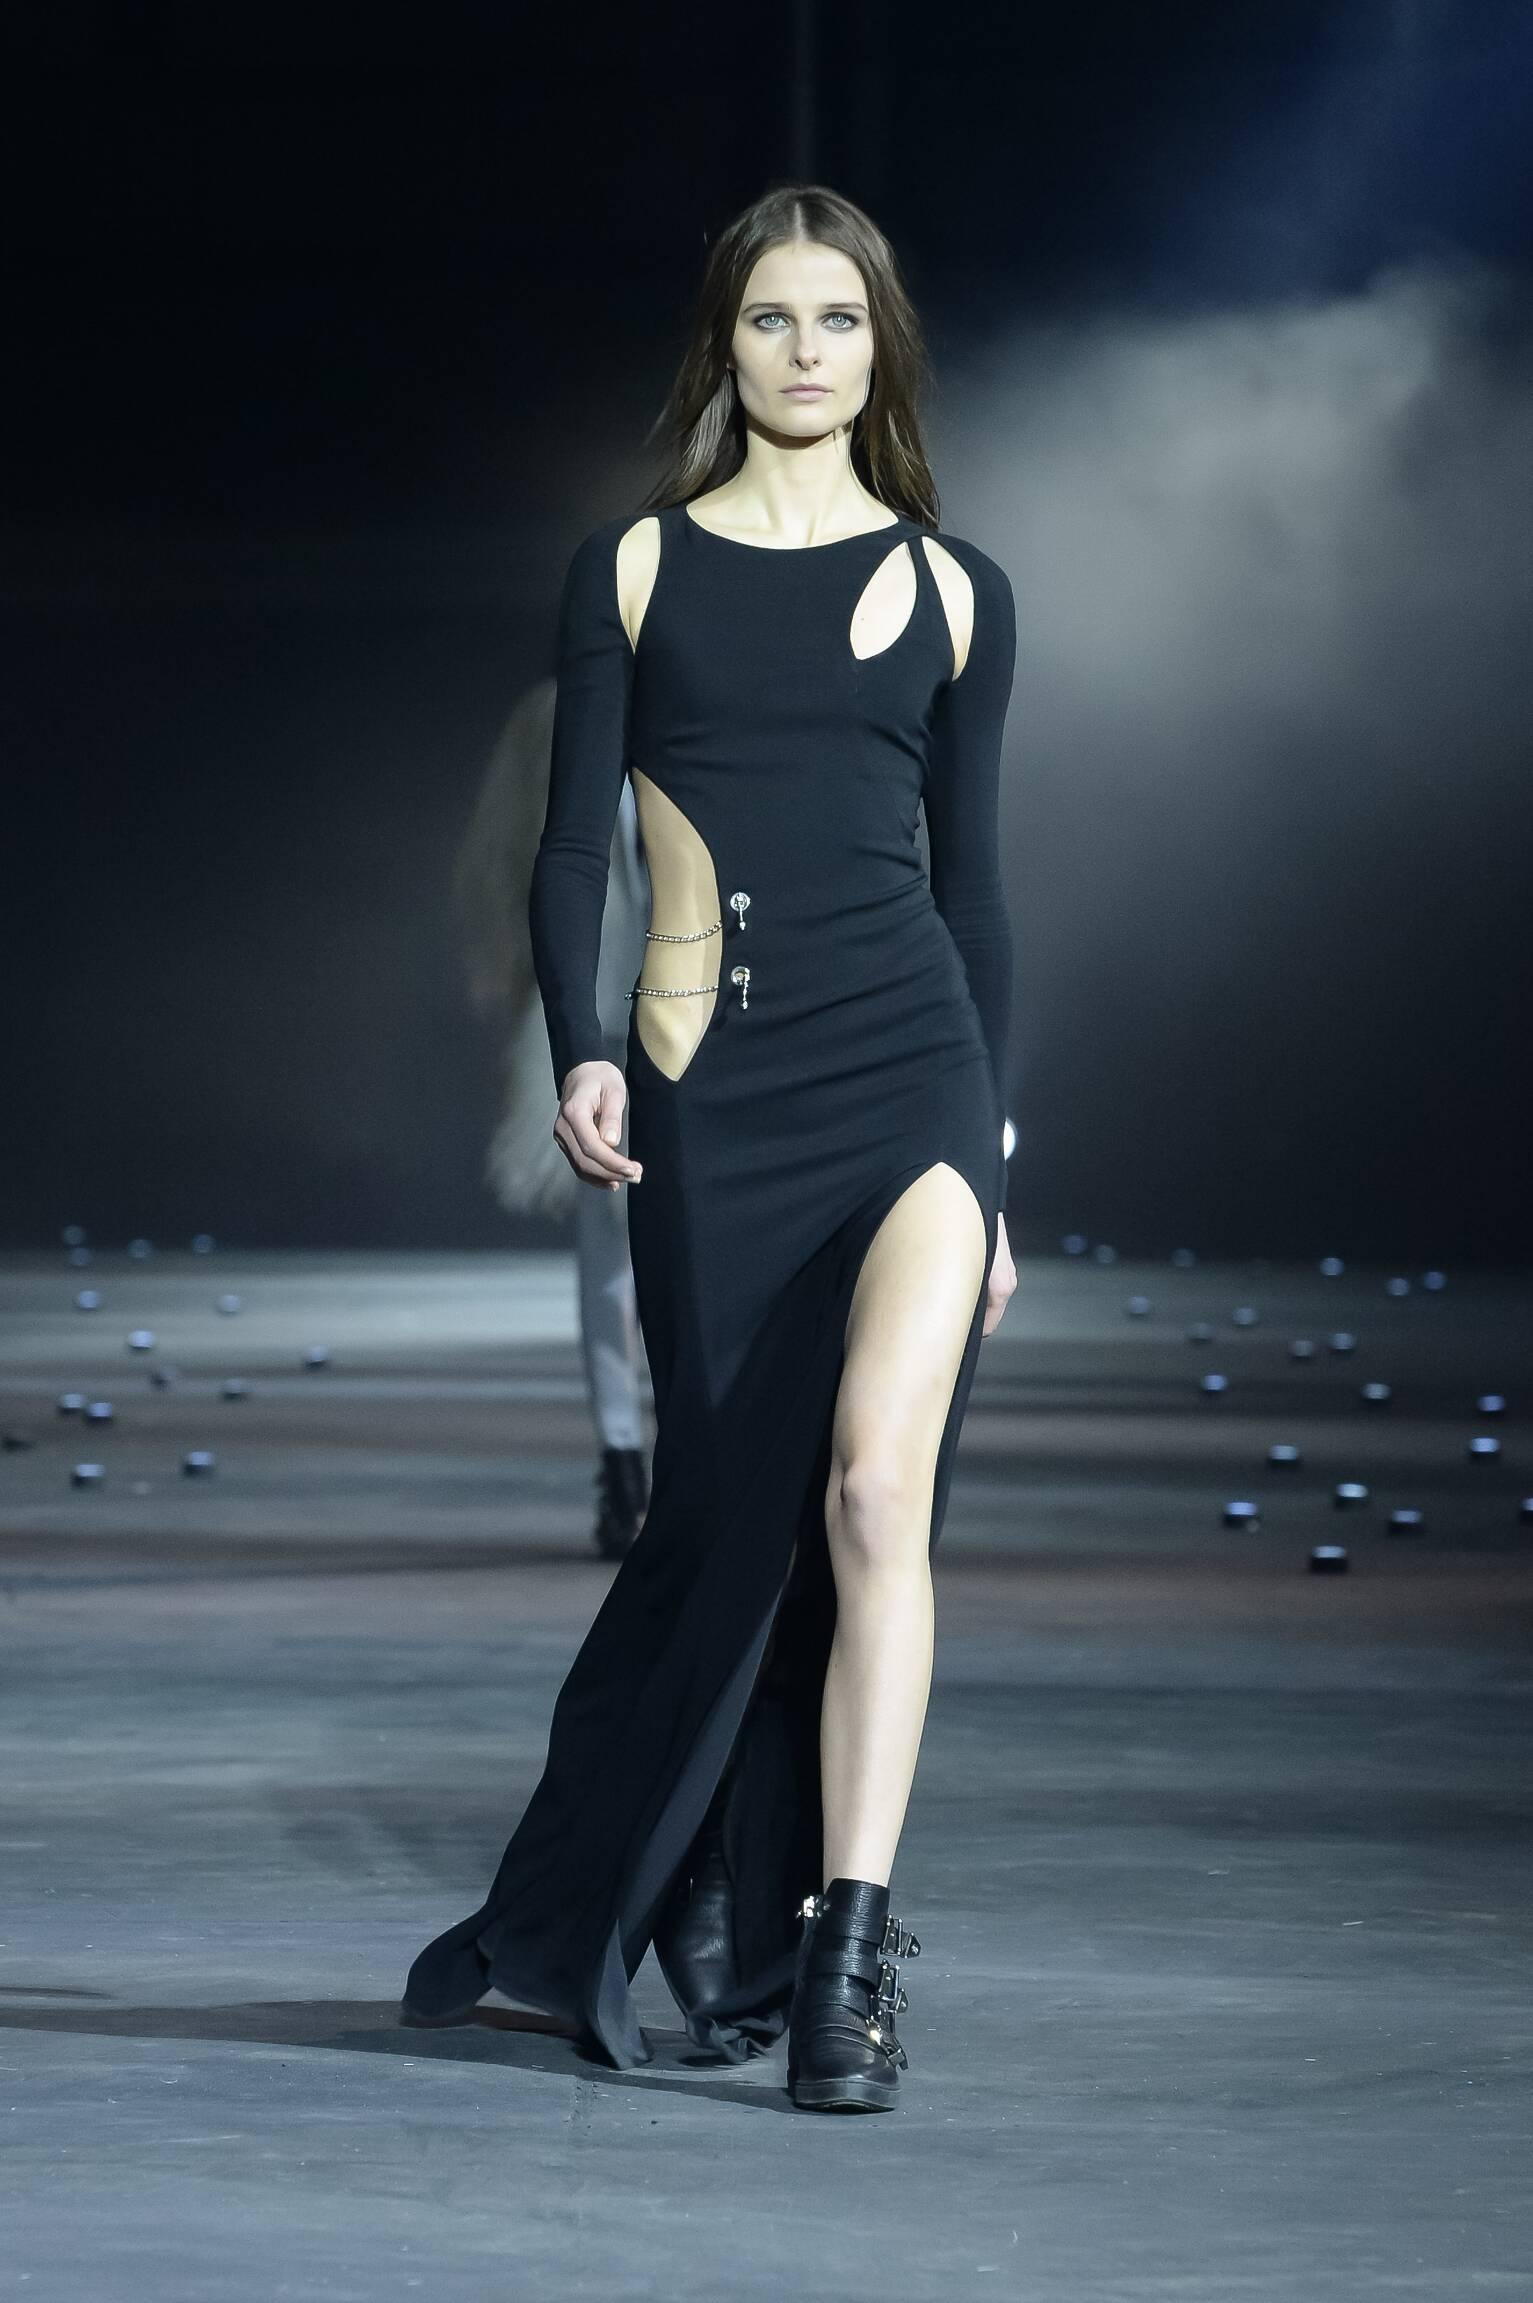 Catwalk Philipp Plein Fall Winter 2015 16 Women's Collection Milan Fashion Week